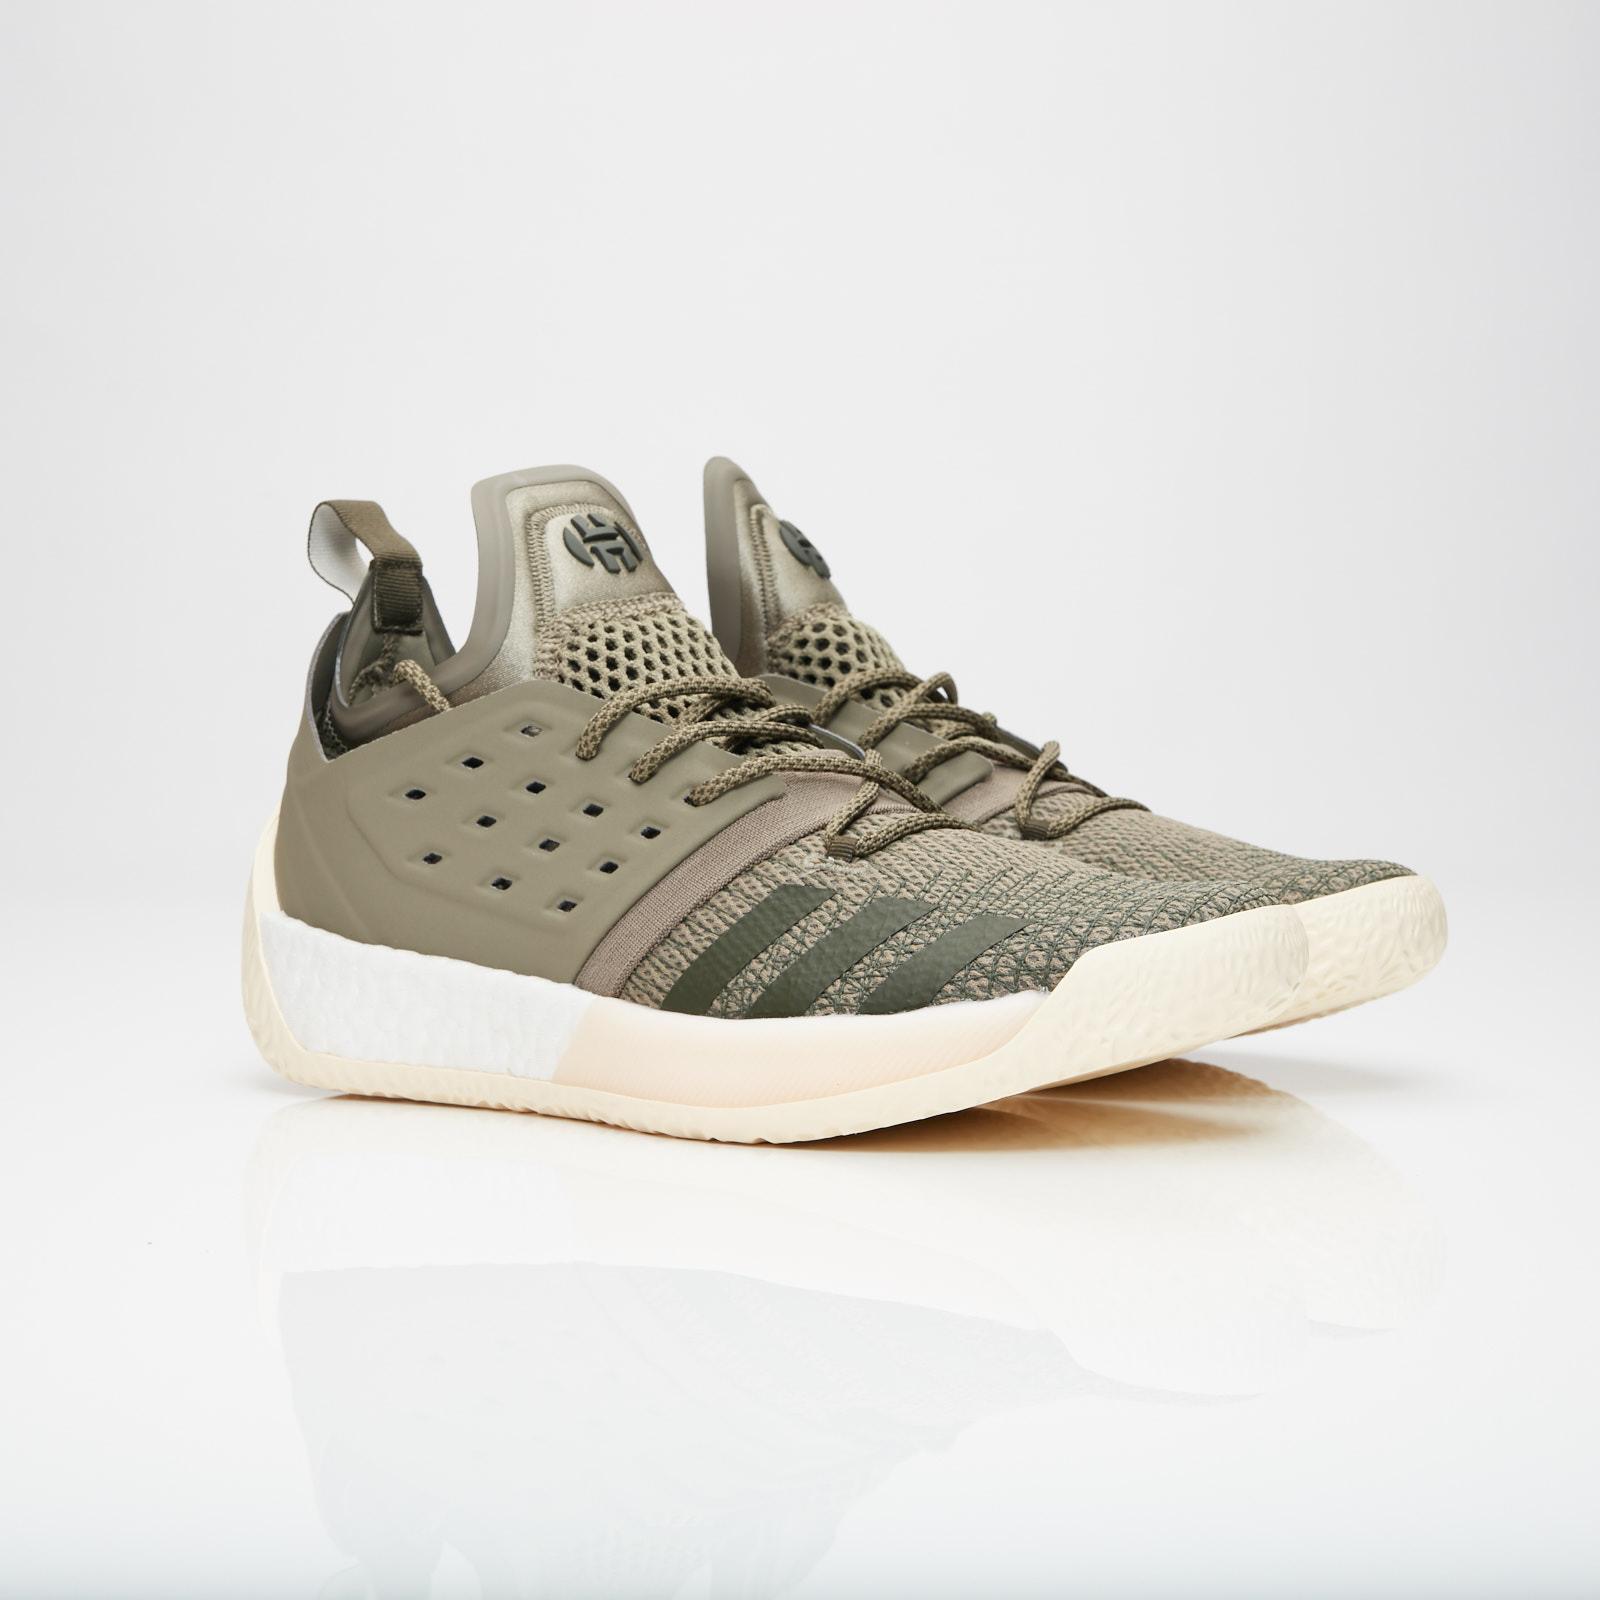 2 Cargo Men New James Harden Basketball Sneakers AQ0027 adidas Harden Vol